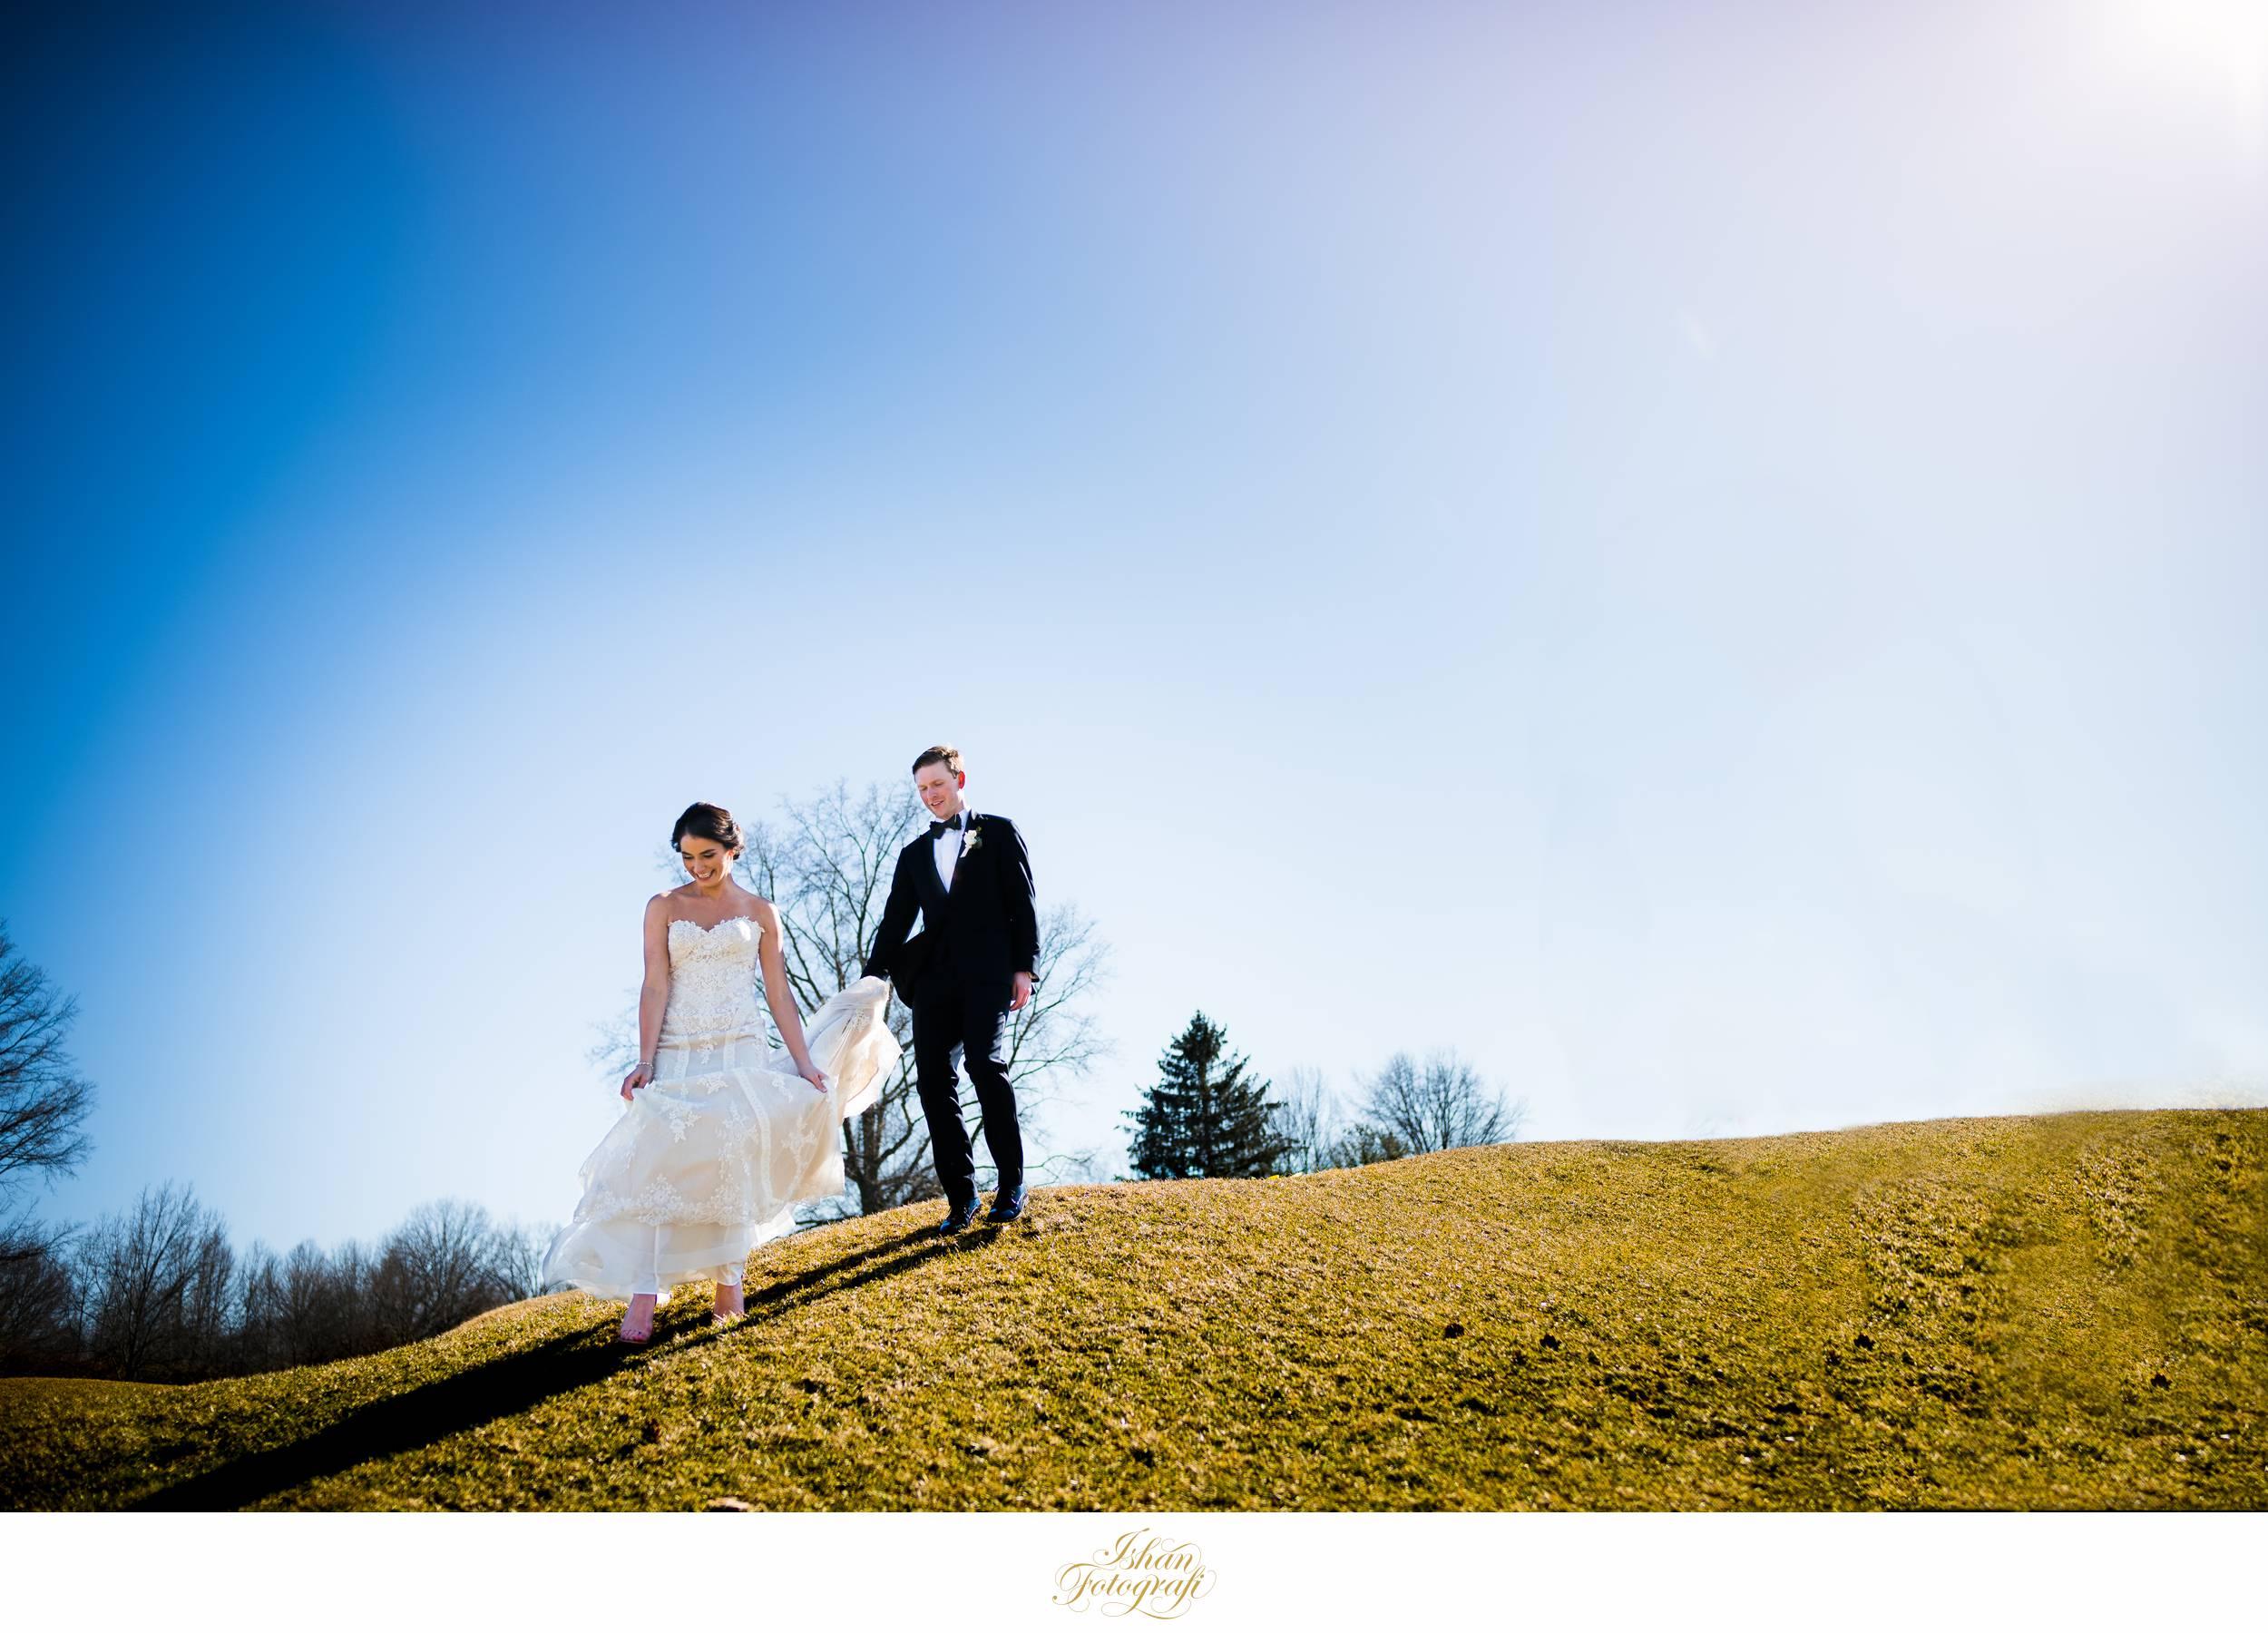 editorial-wedding-photographer-new-jersey